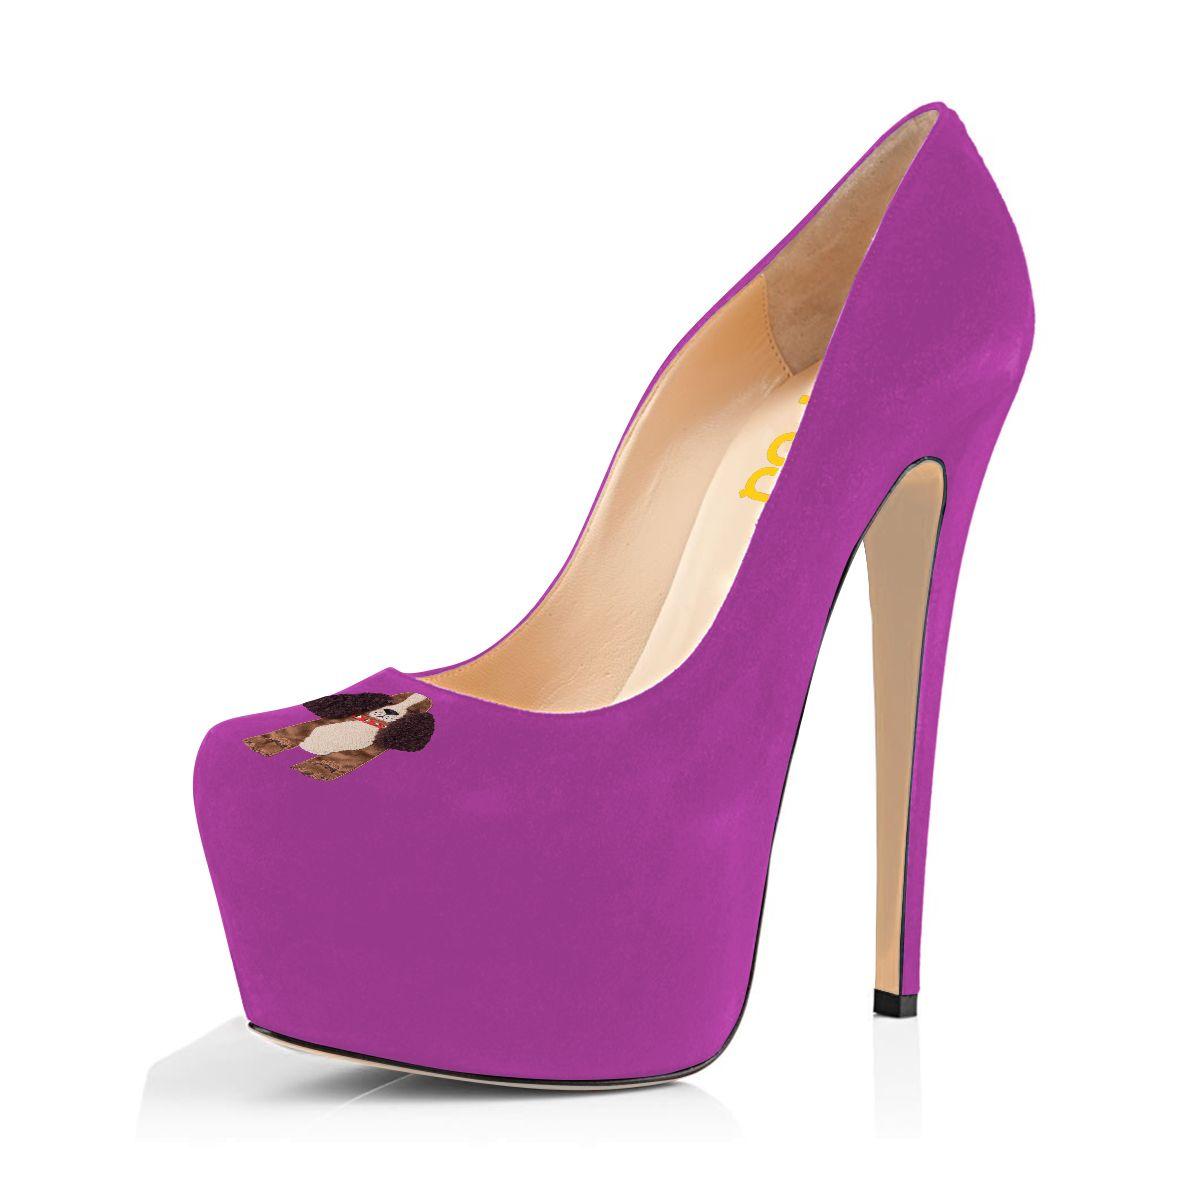 Women s Orchid Suede Doggie Printed Platform Heels Stiletto Pumps   elegantshoegirl  shoes  ankle  boots  flats  fashions  womens 2192bed72a40